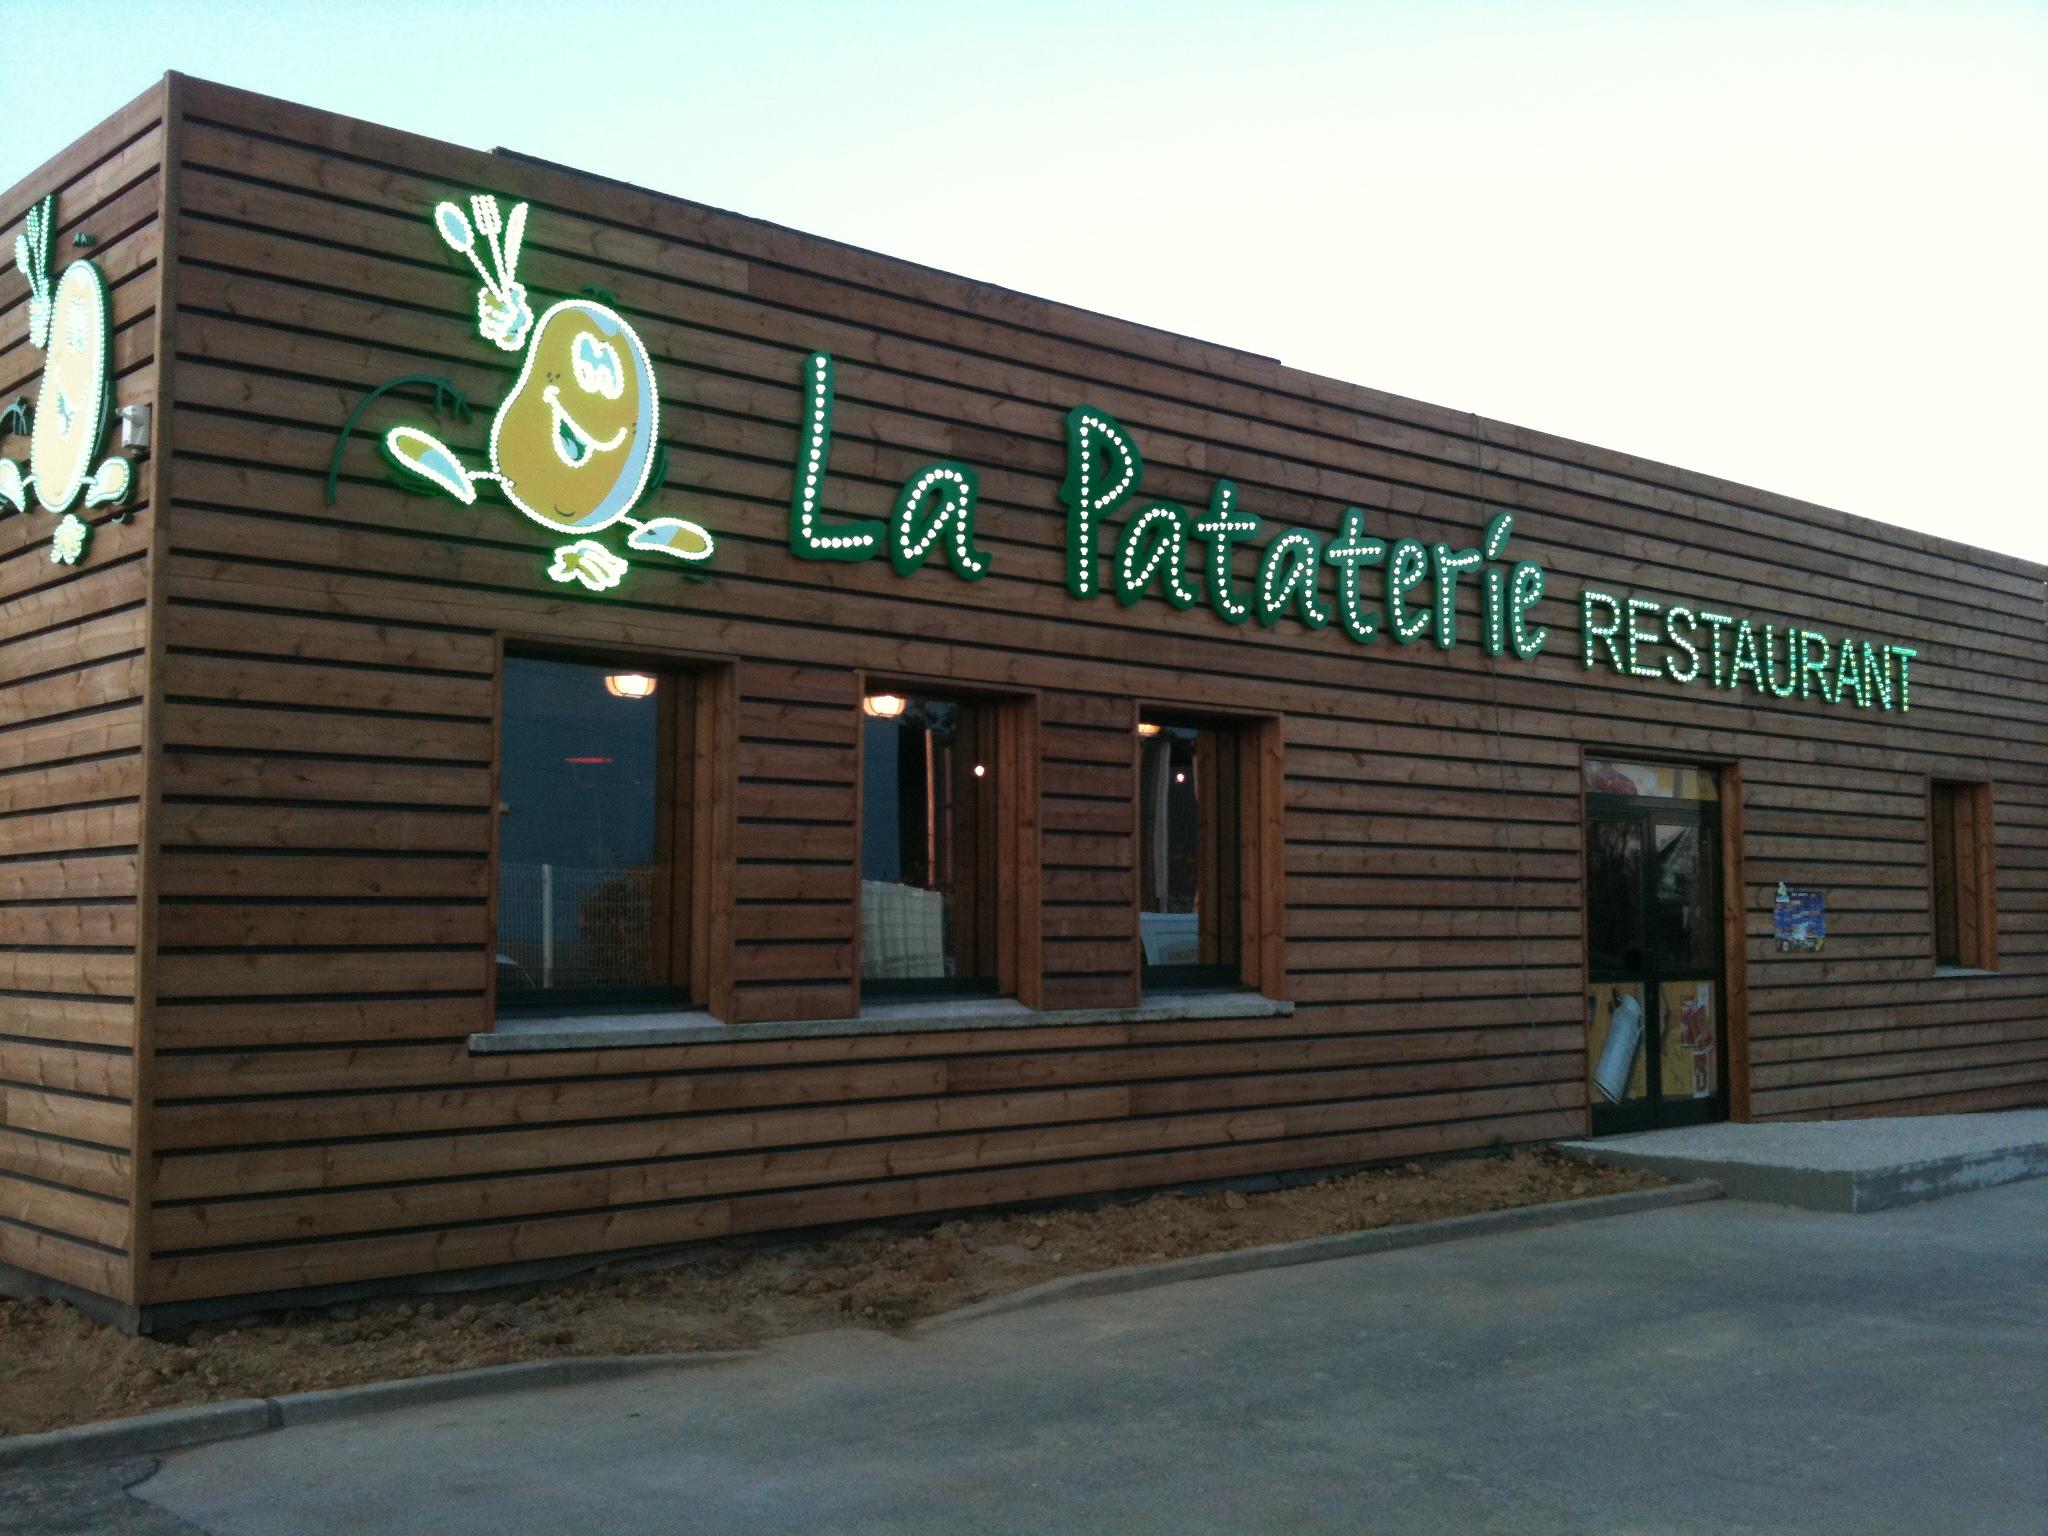 Restaurant La Pataterie - Faches